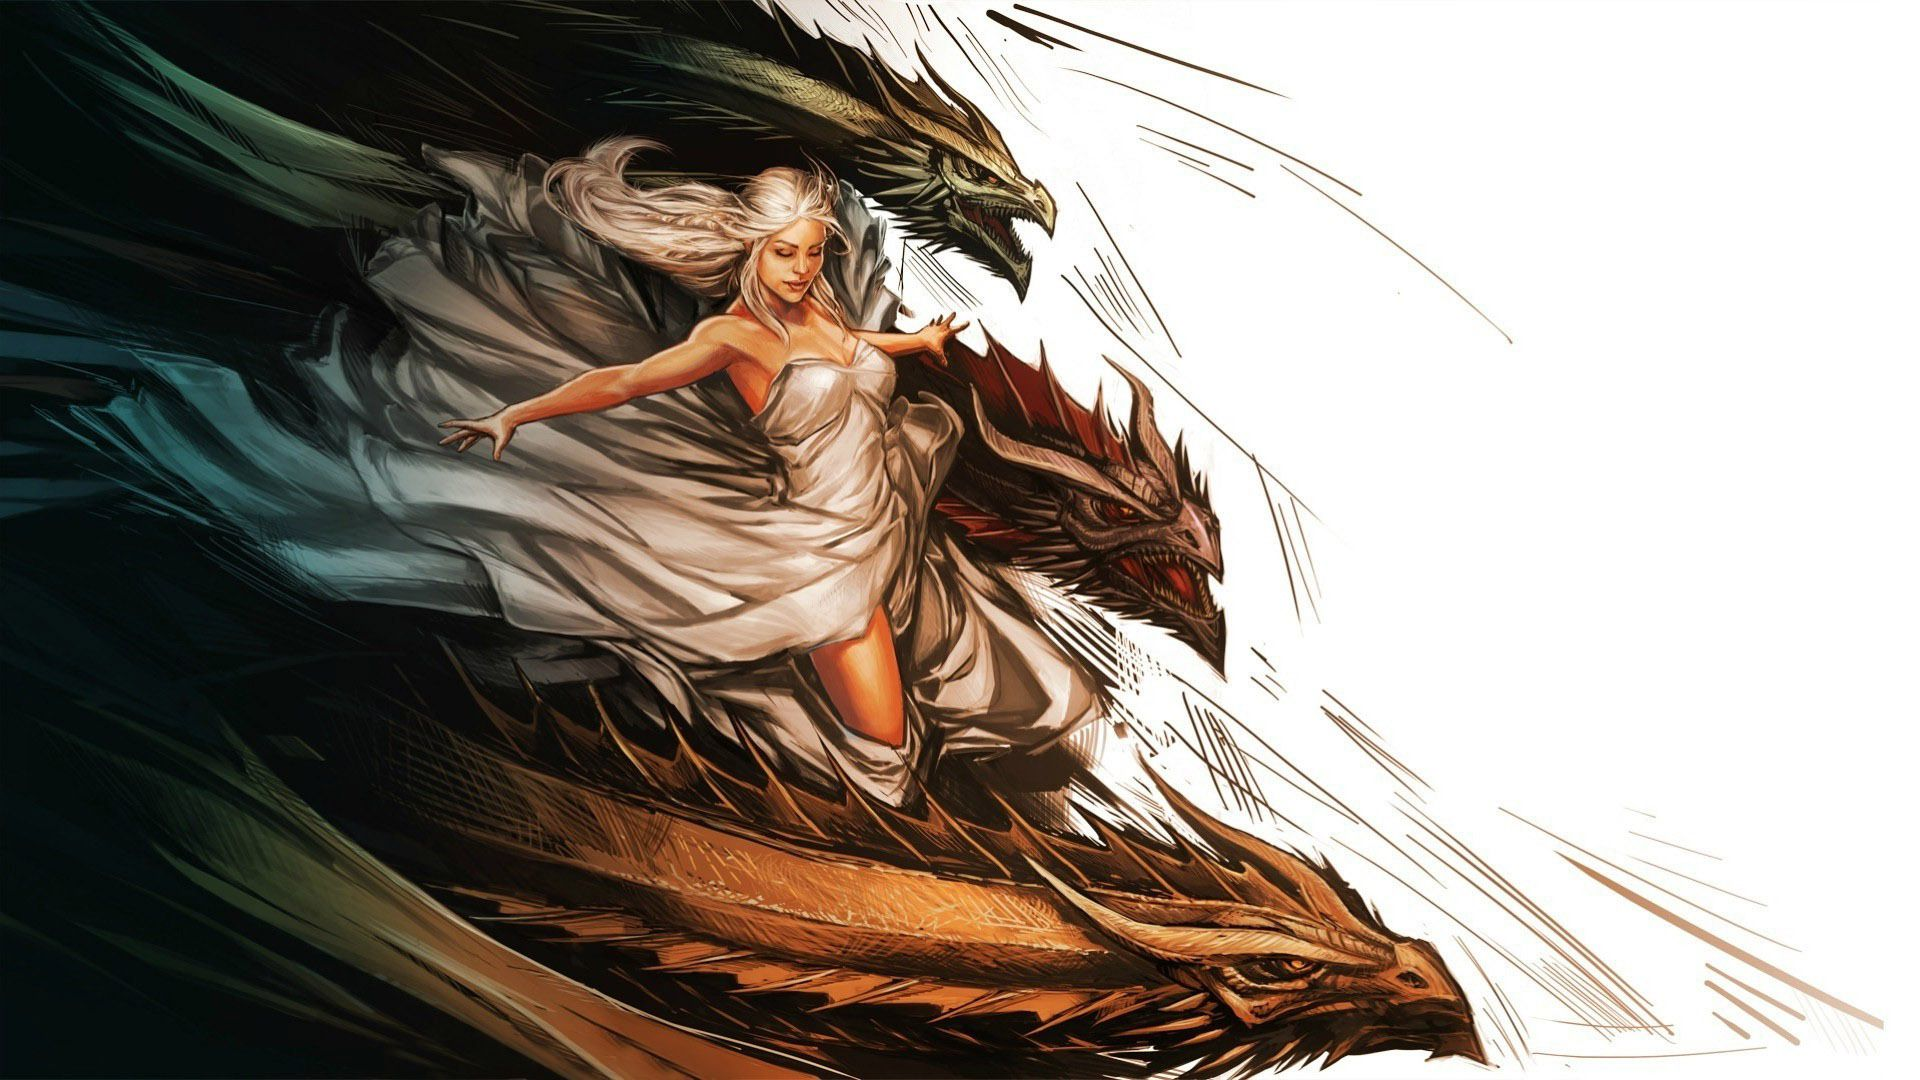 Daenerys Dragons Daenerys Targaryen Dragon Game of